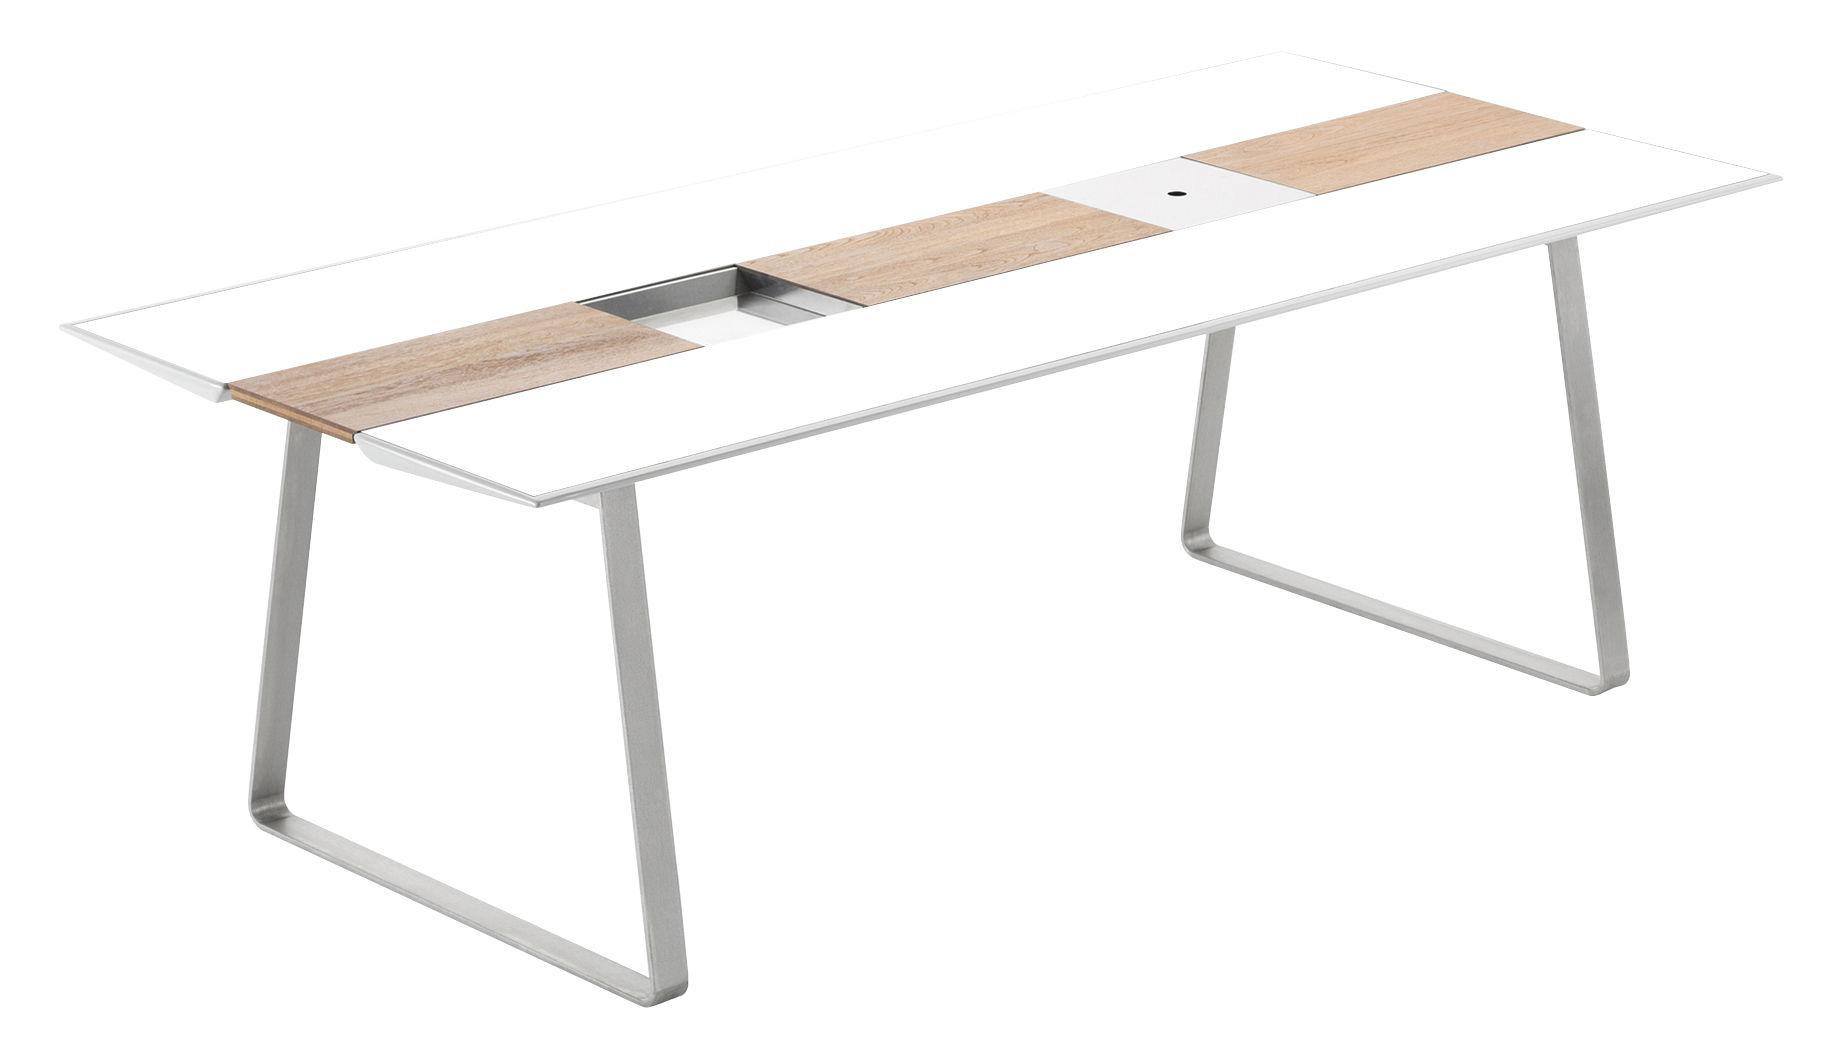 Outdoor - Tables de jardin - Table rectangulaire Extrados / Corian - L 242 cm - EGO Paris - Plateau blanc / Chemin de table teck & blanc - Corian, Inox brossé, Teck